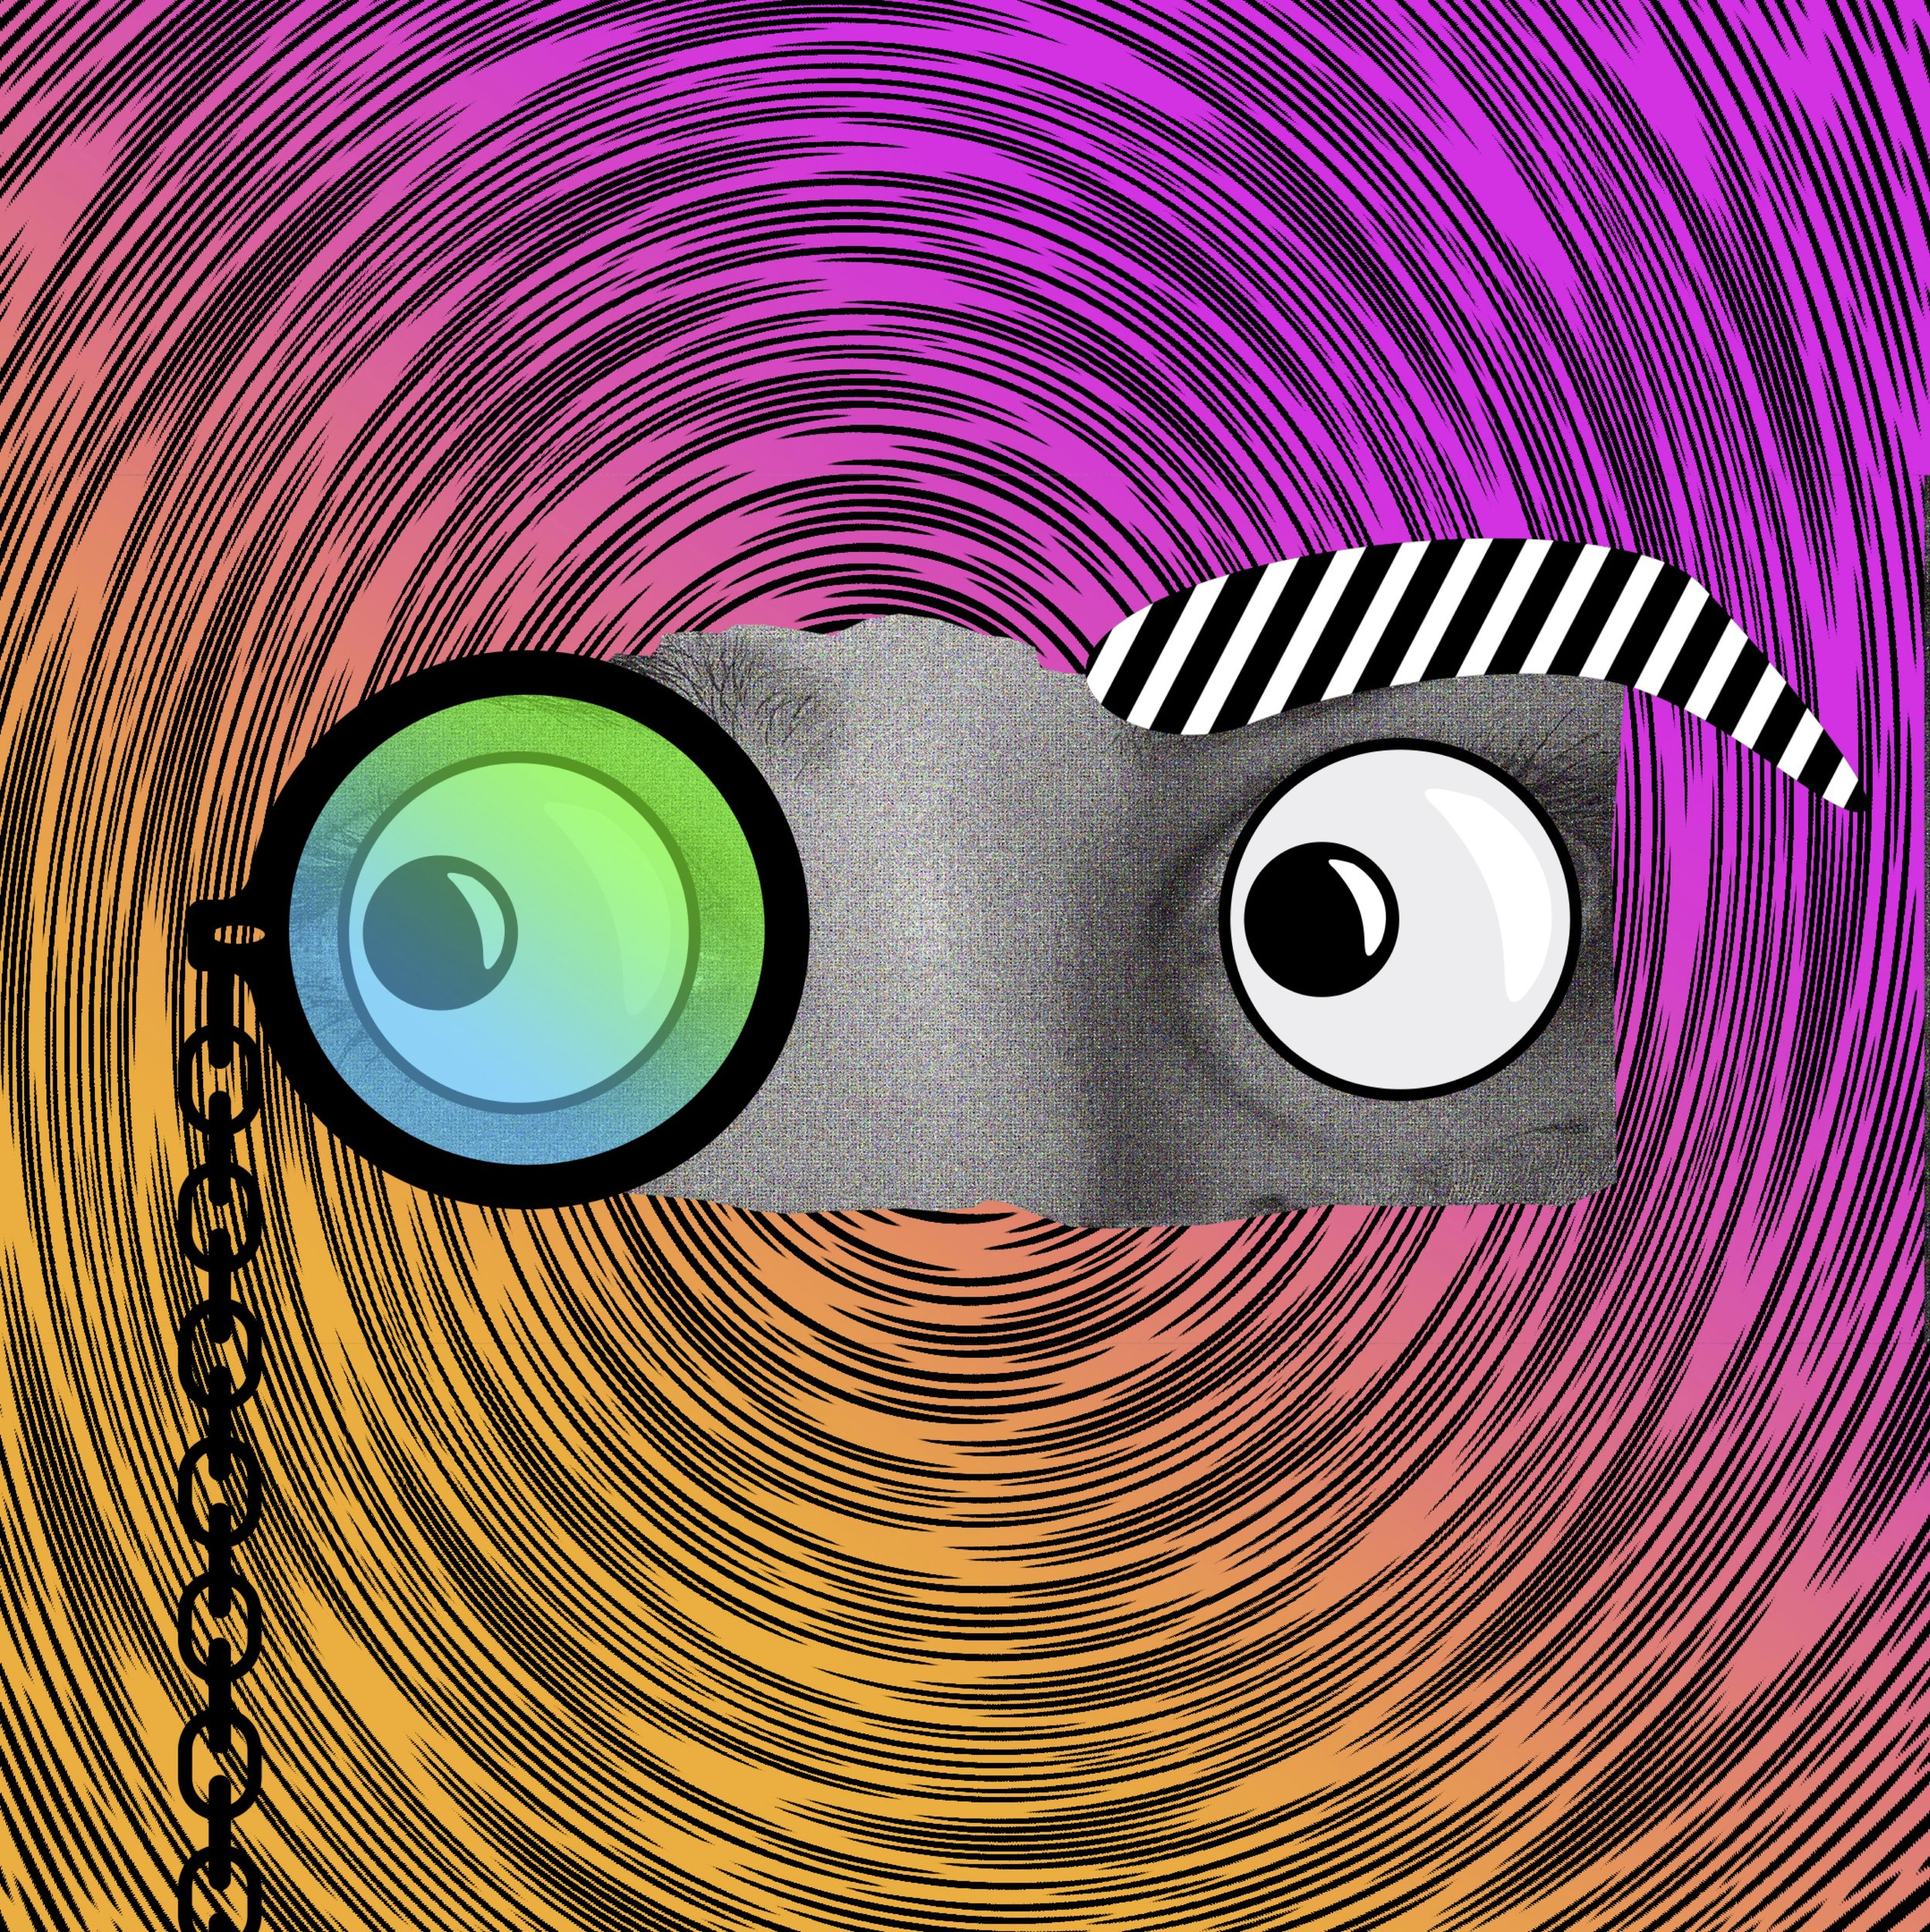 HyperactiveImagery (dragged) 2.jpg